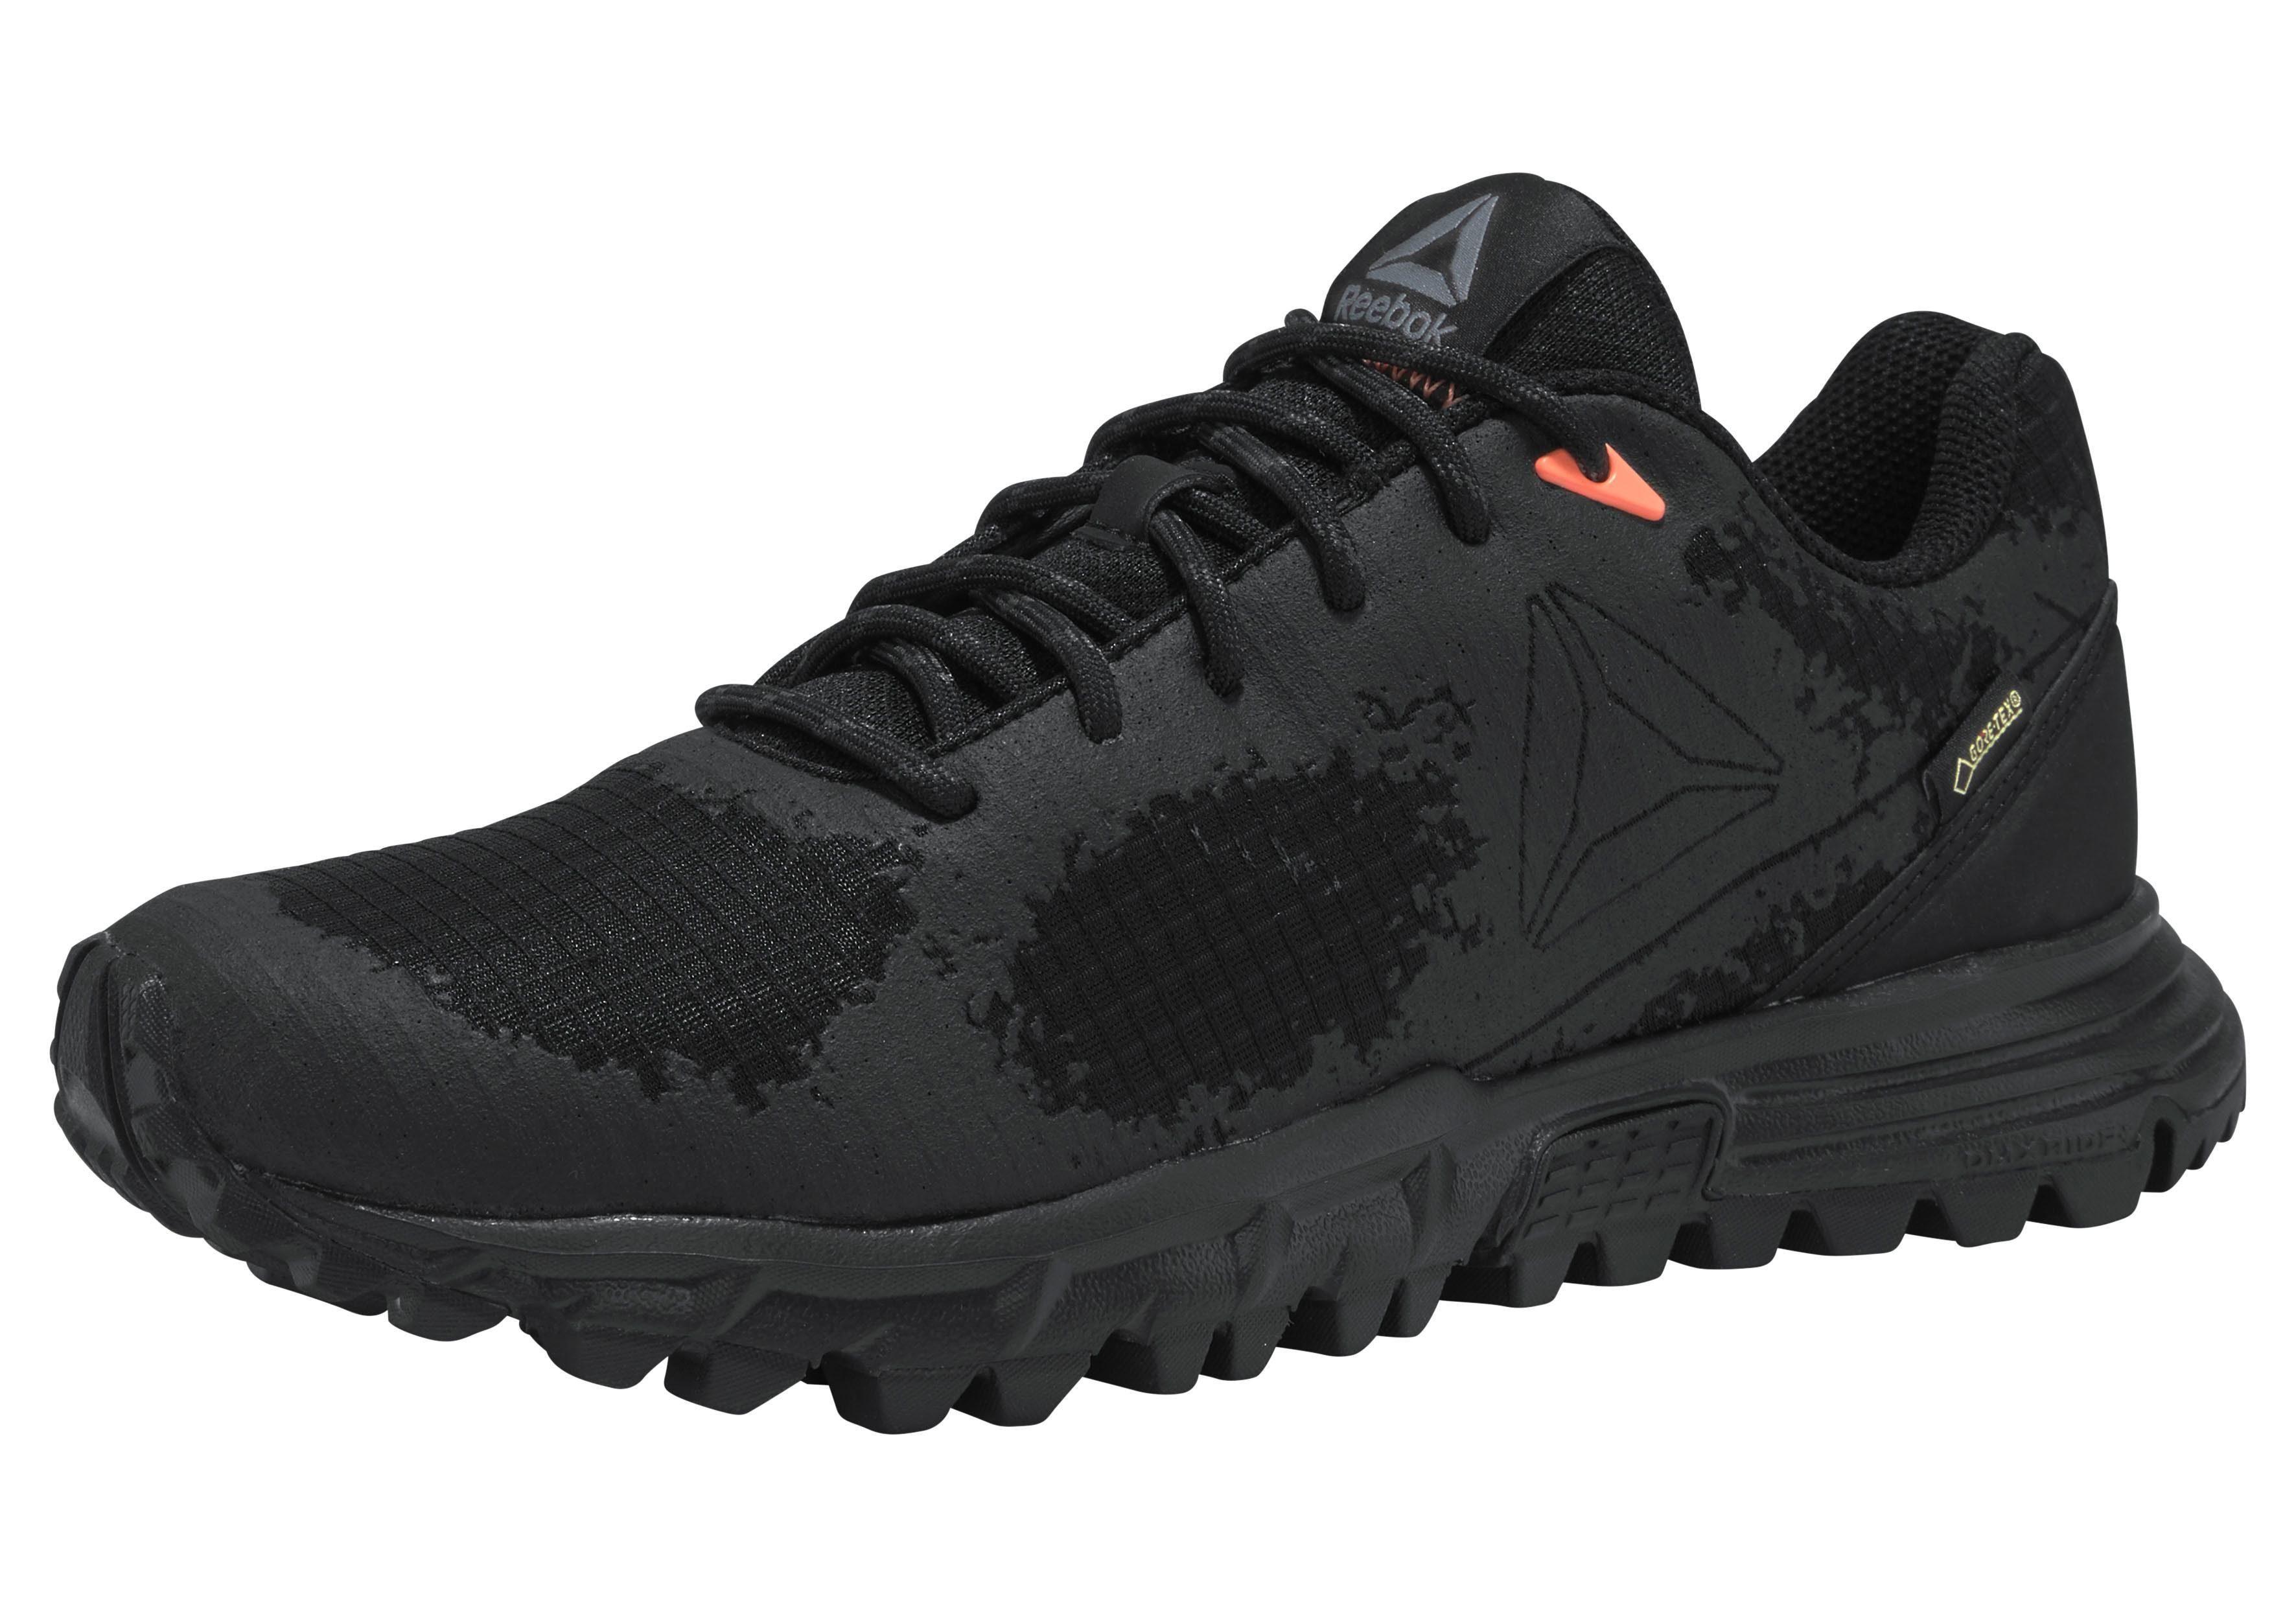 Reebok »SAWCUT GORETEX 6 W« Walkingschuh kaufen | OTTO